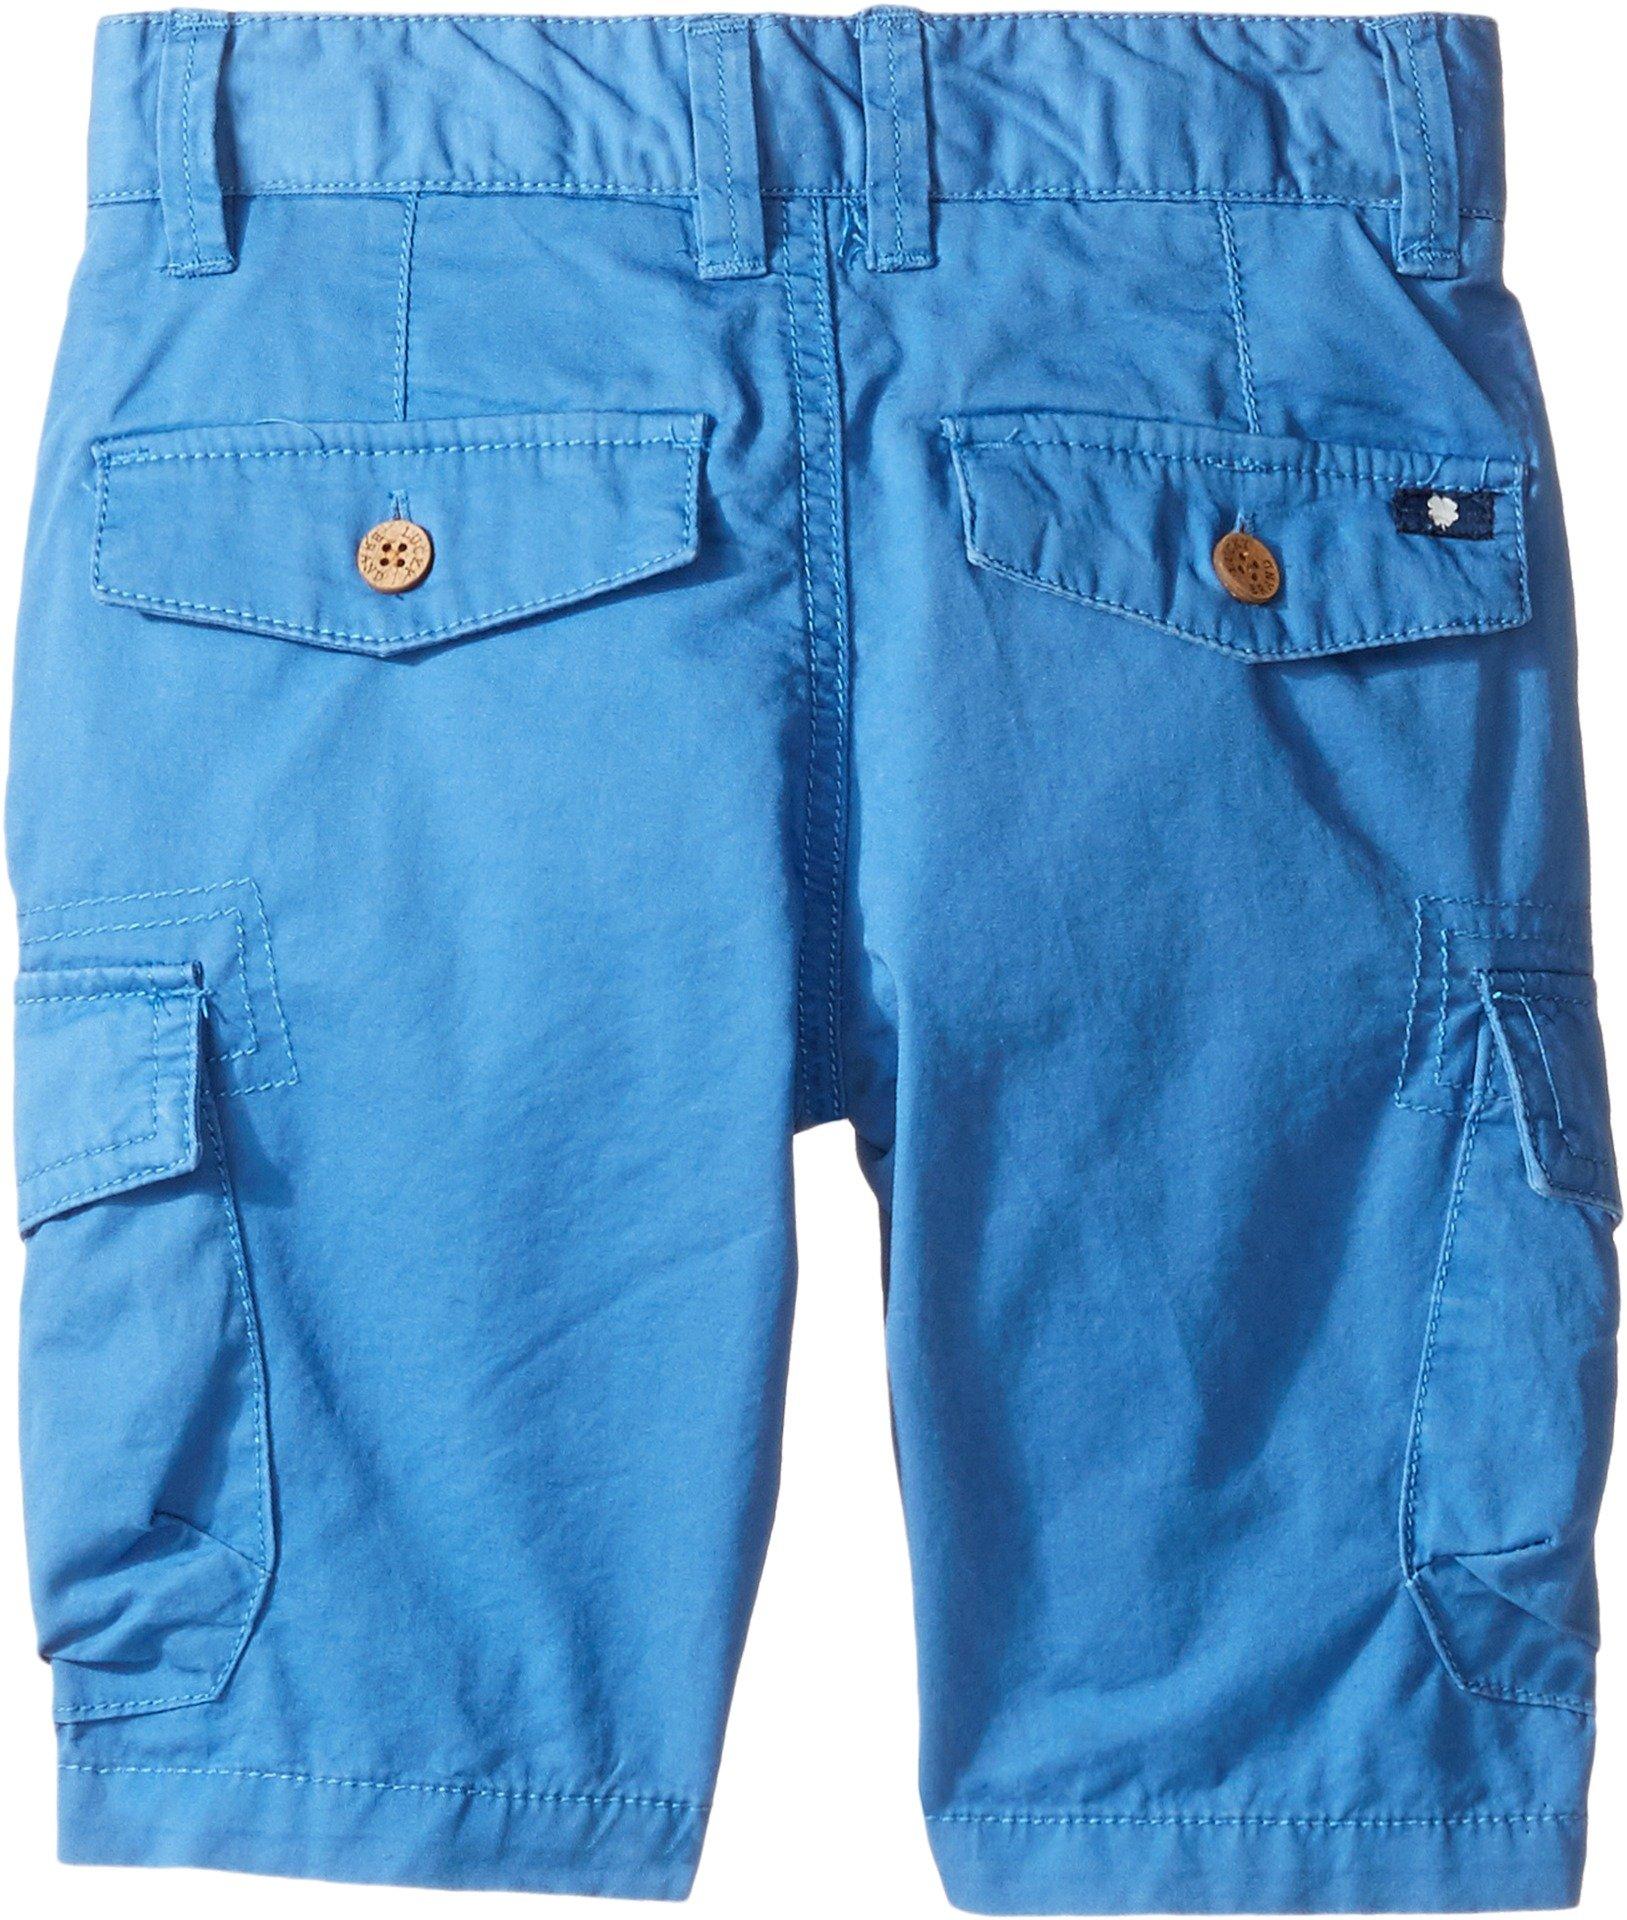 Lucky Brand Toddler Boys' Heritage Short, Blue, 2T